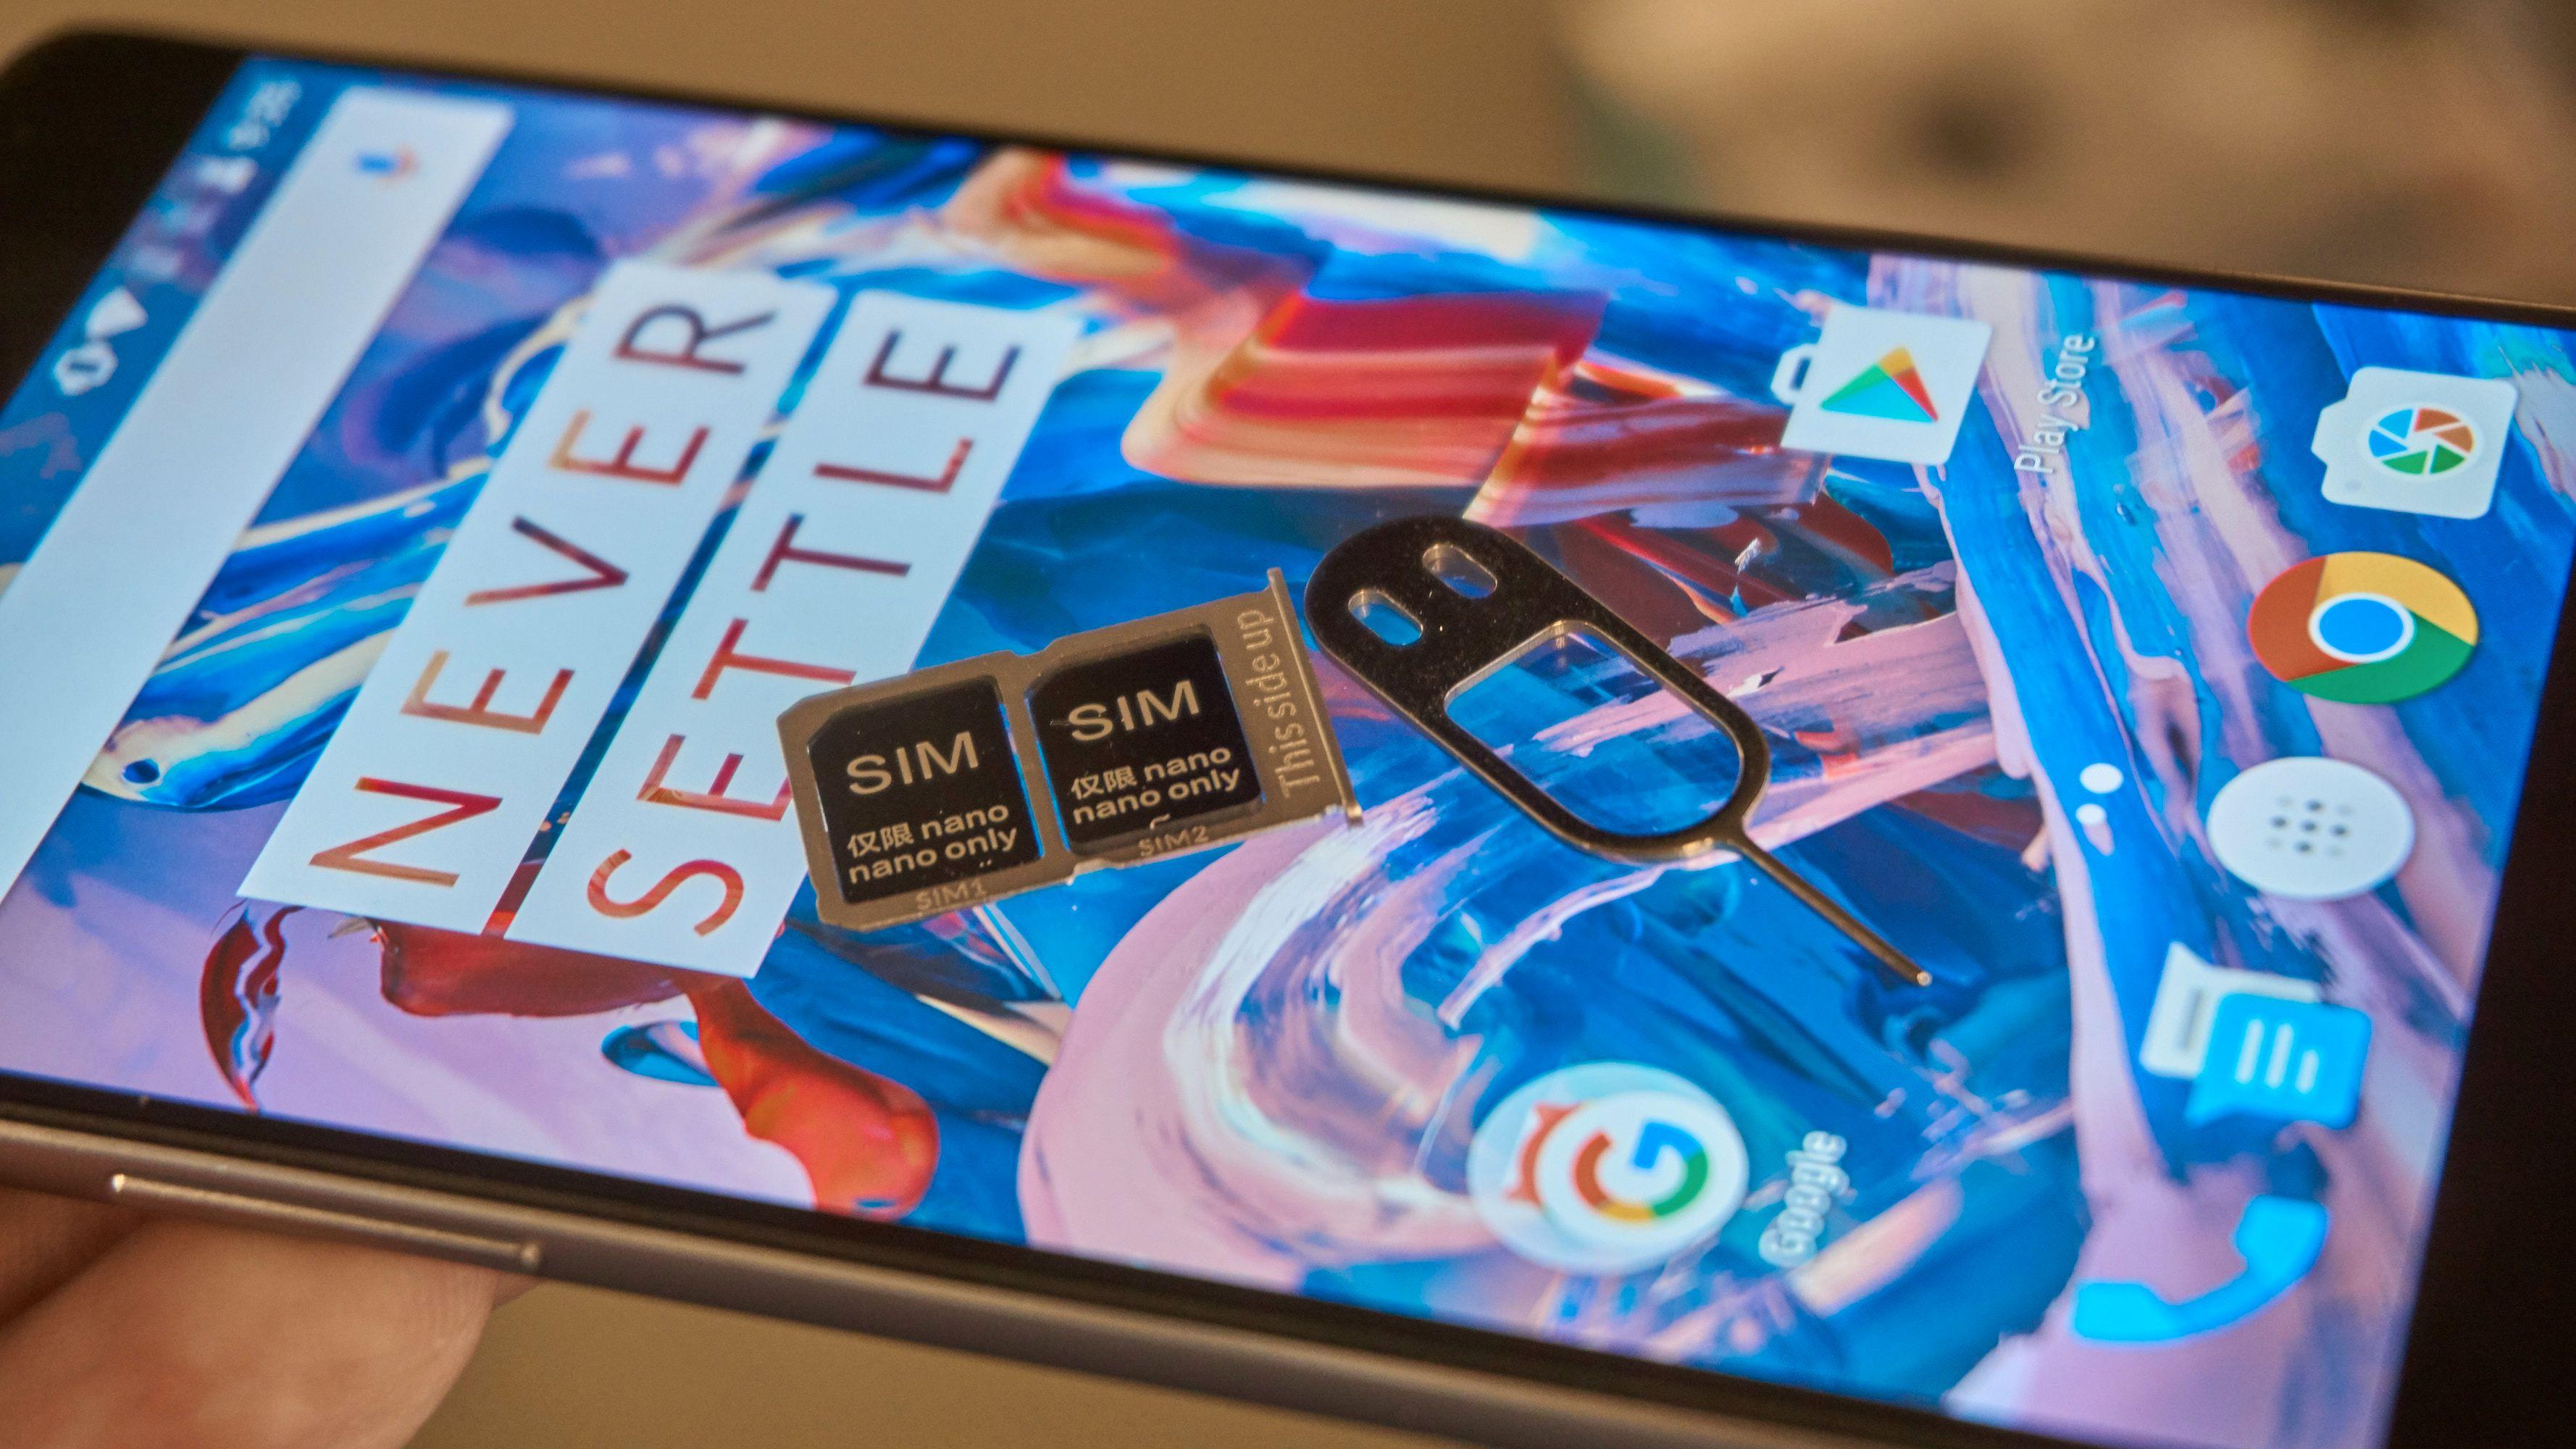 Det er plass til to SIM-kort, men ikke minnekort.